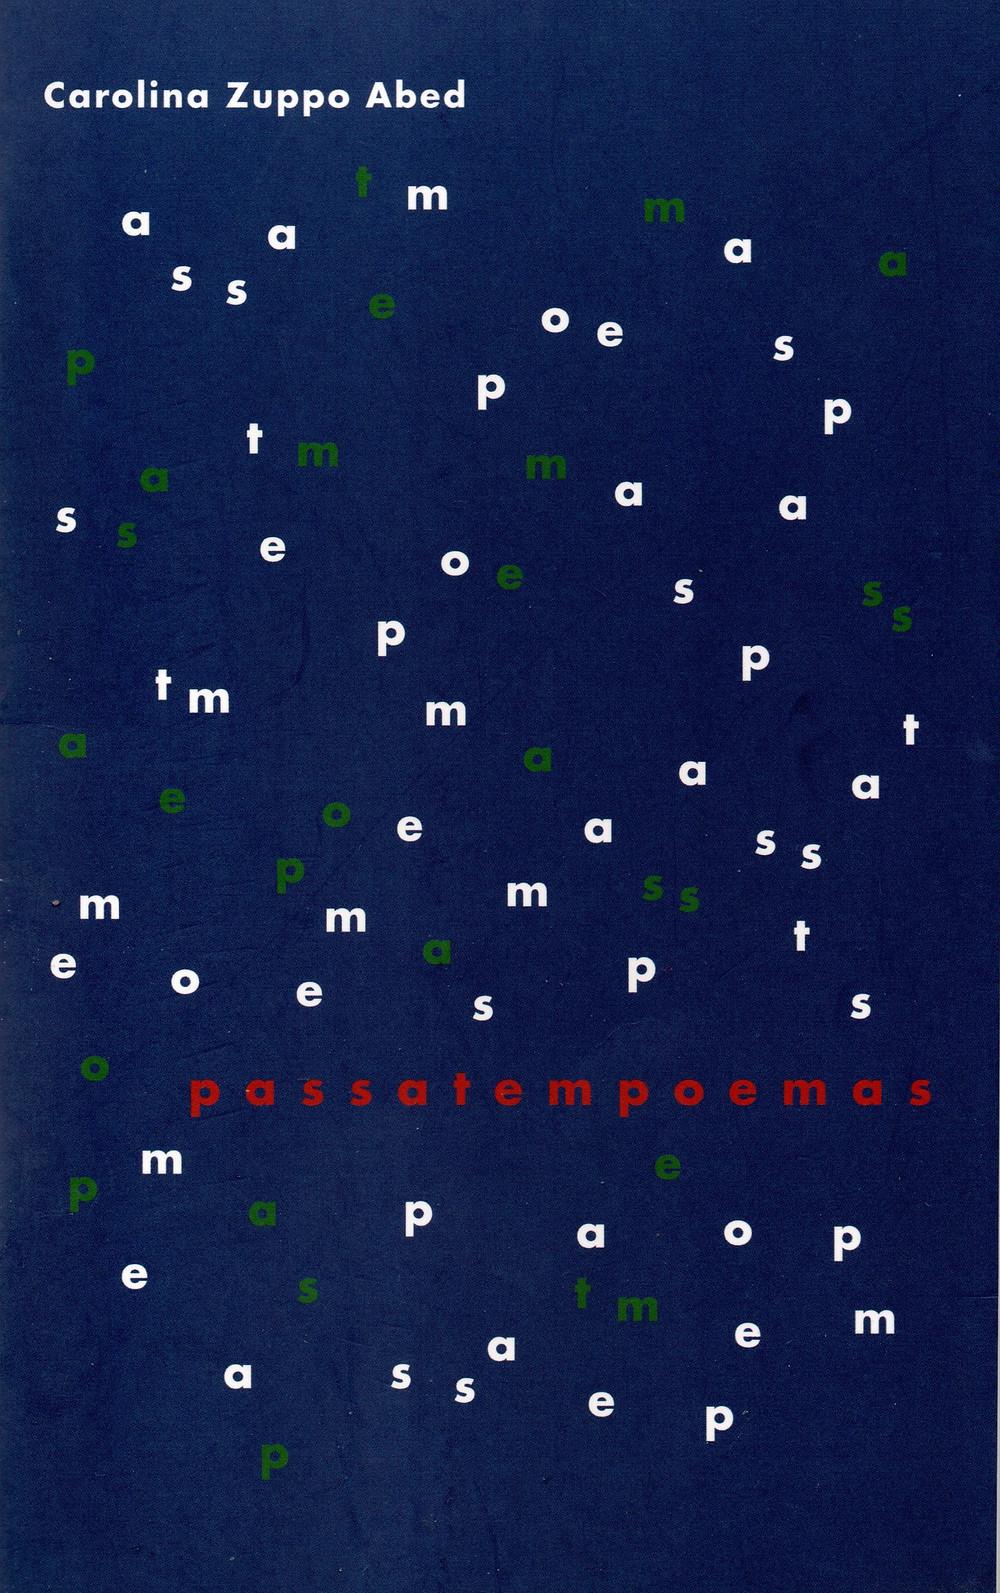 Passatempoemas – Desafios Verbo-lógico-matemáticos de Carolina Zuppo Abed